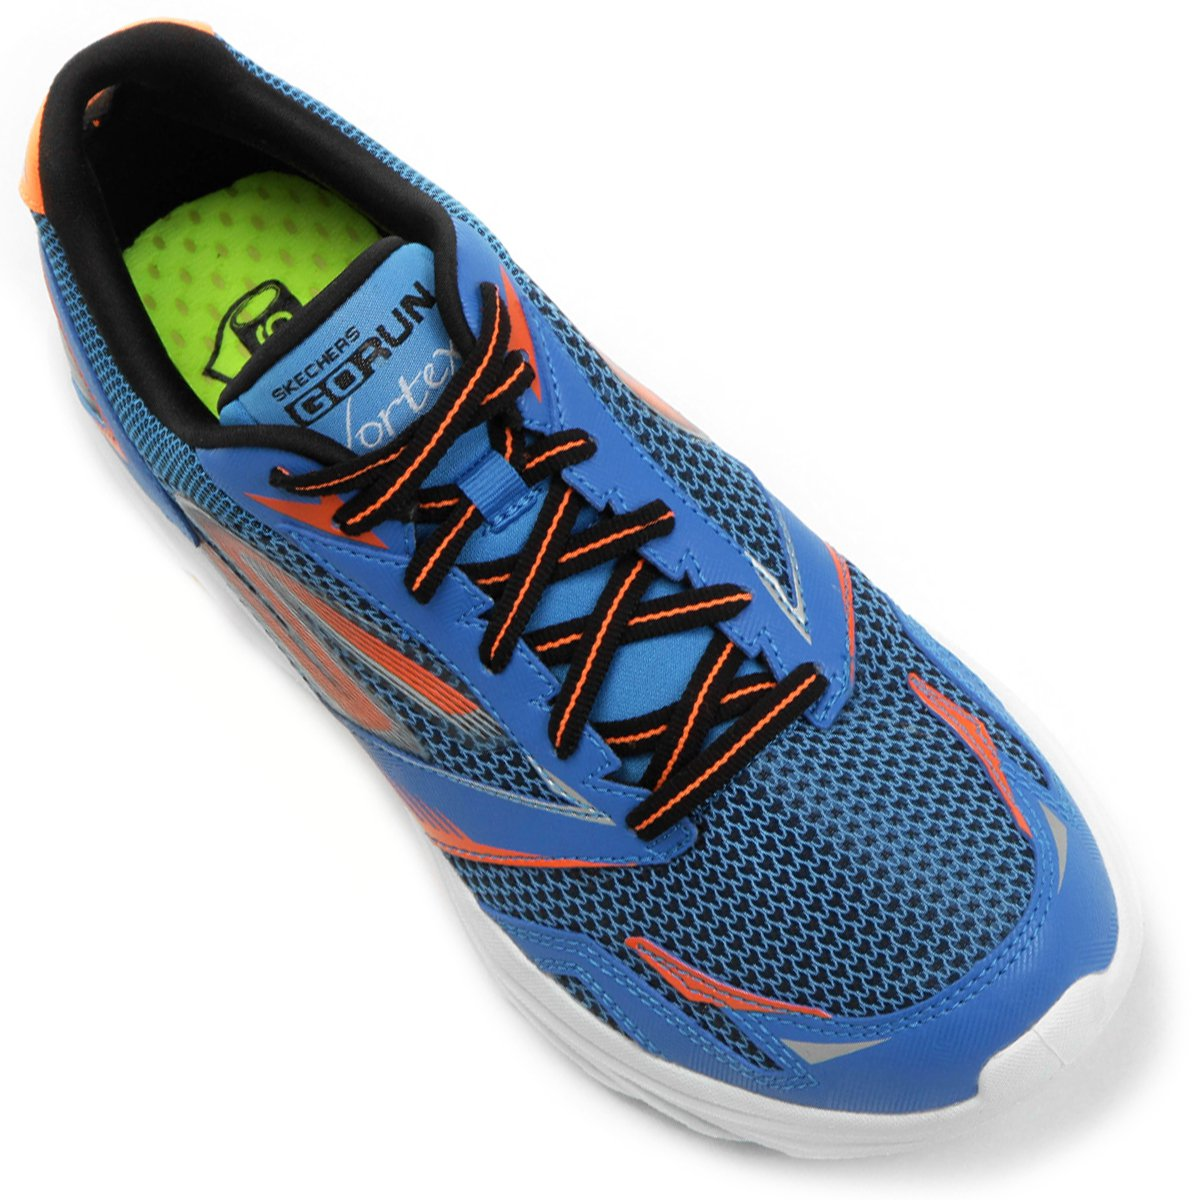 61e89ac27f ... Tênis Skechers Go Run Vortex Masculino - Compre Agora Netshoes  4eeccd9d5e852f ...